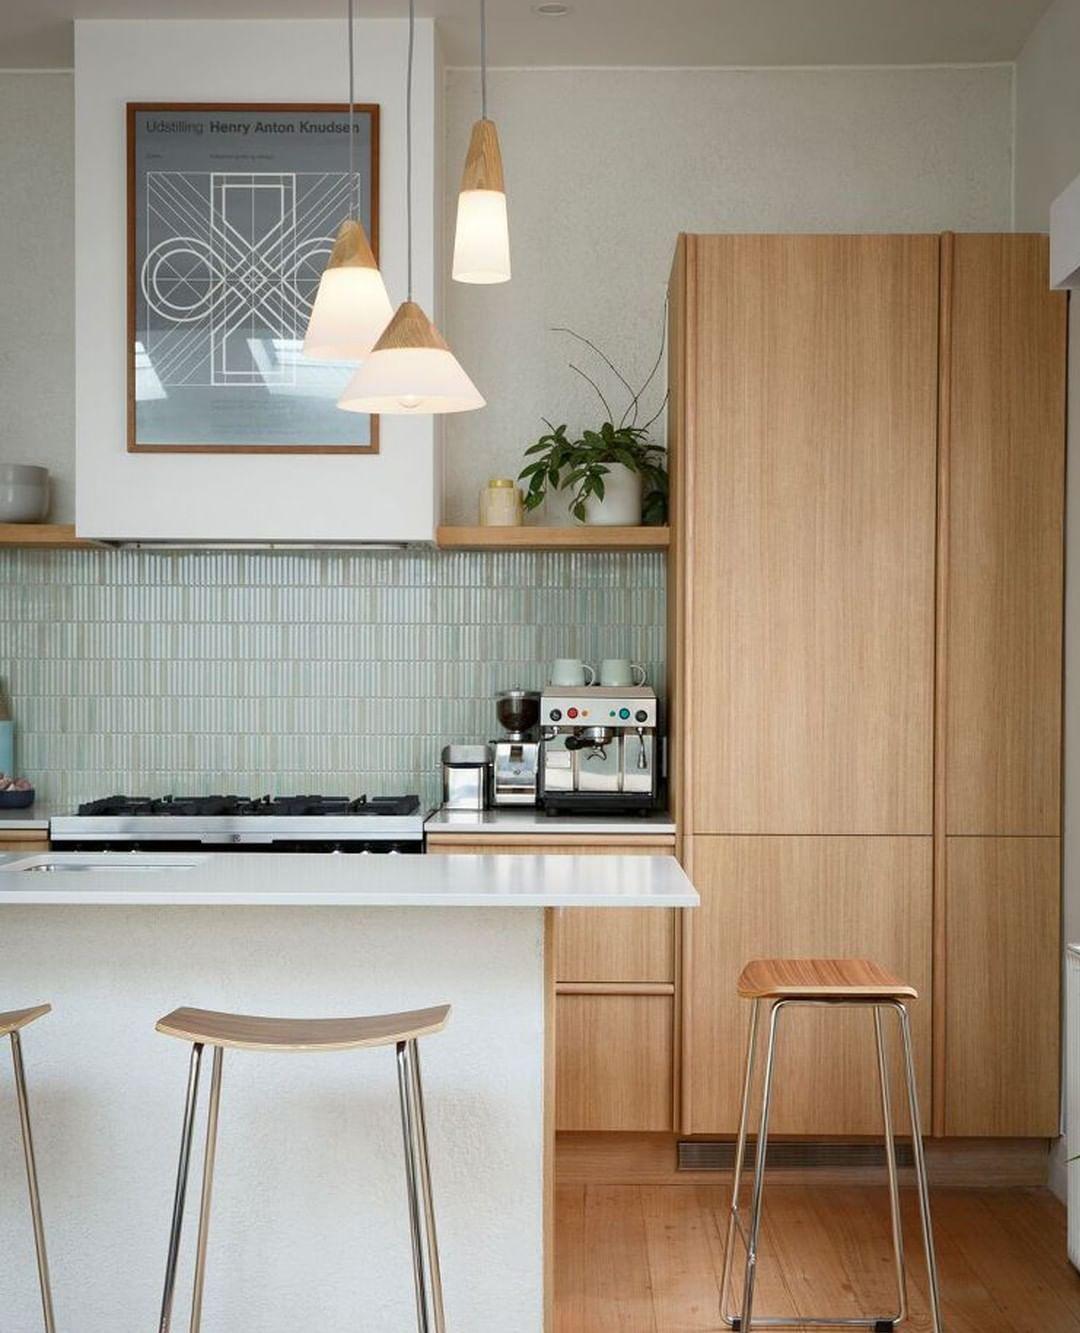 Homes To Love Nz On Instagram Everything In This Kitchen Comes Together To Create The U Diy Kitchen Decor Interior Design Kitchen Contemporary Kitchen Design